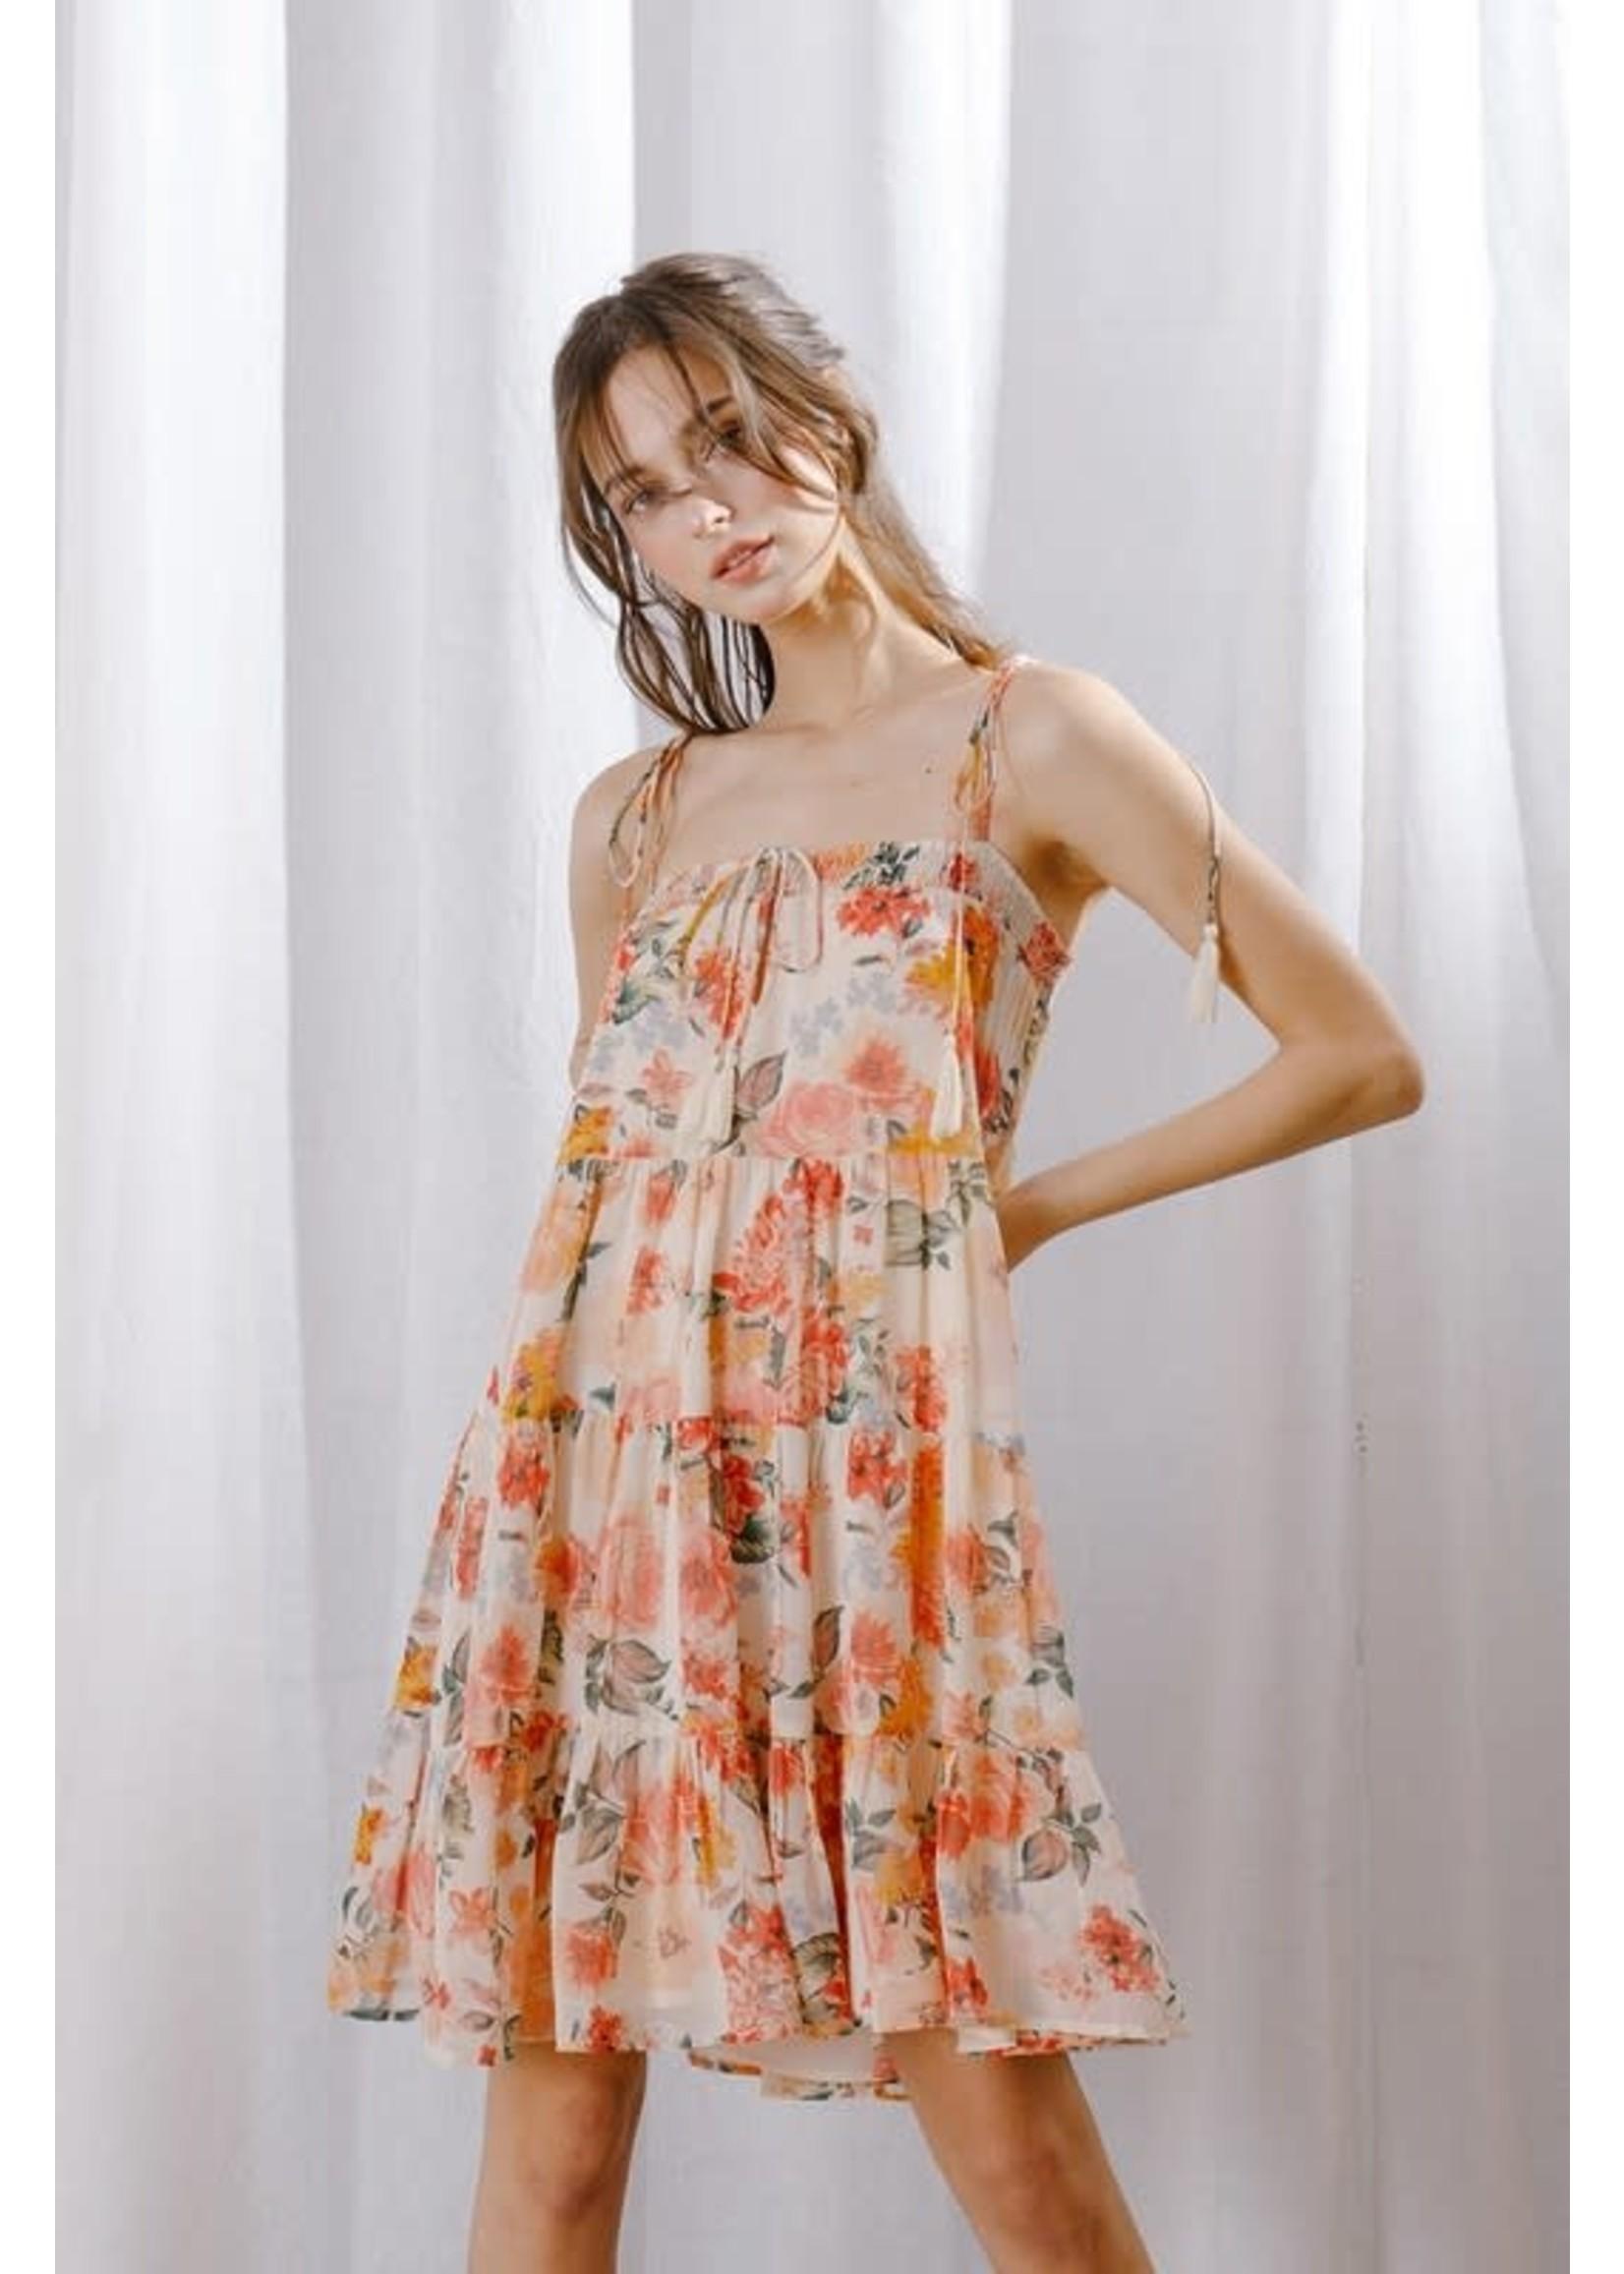 Storia Floral Ruffled Trapeze Strappy Mini Dress - BD2248